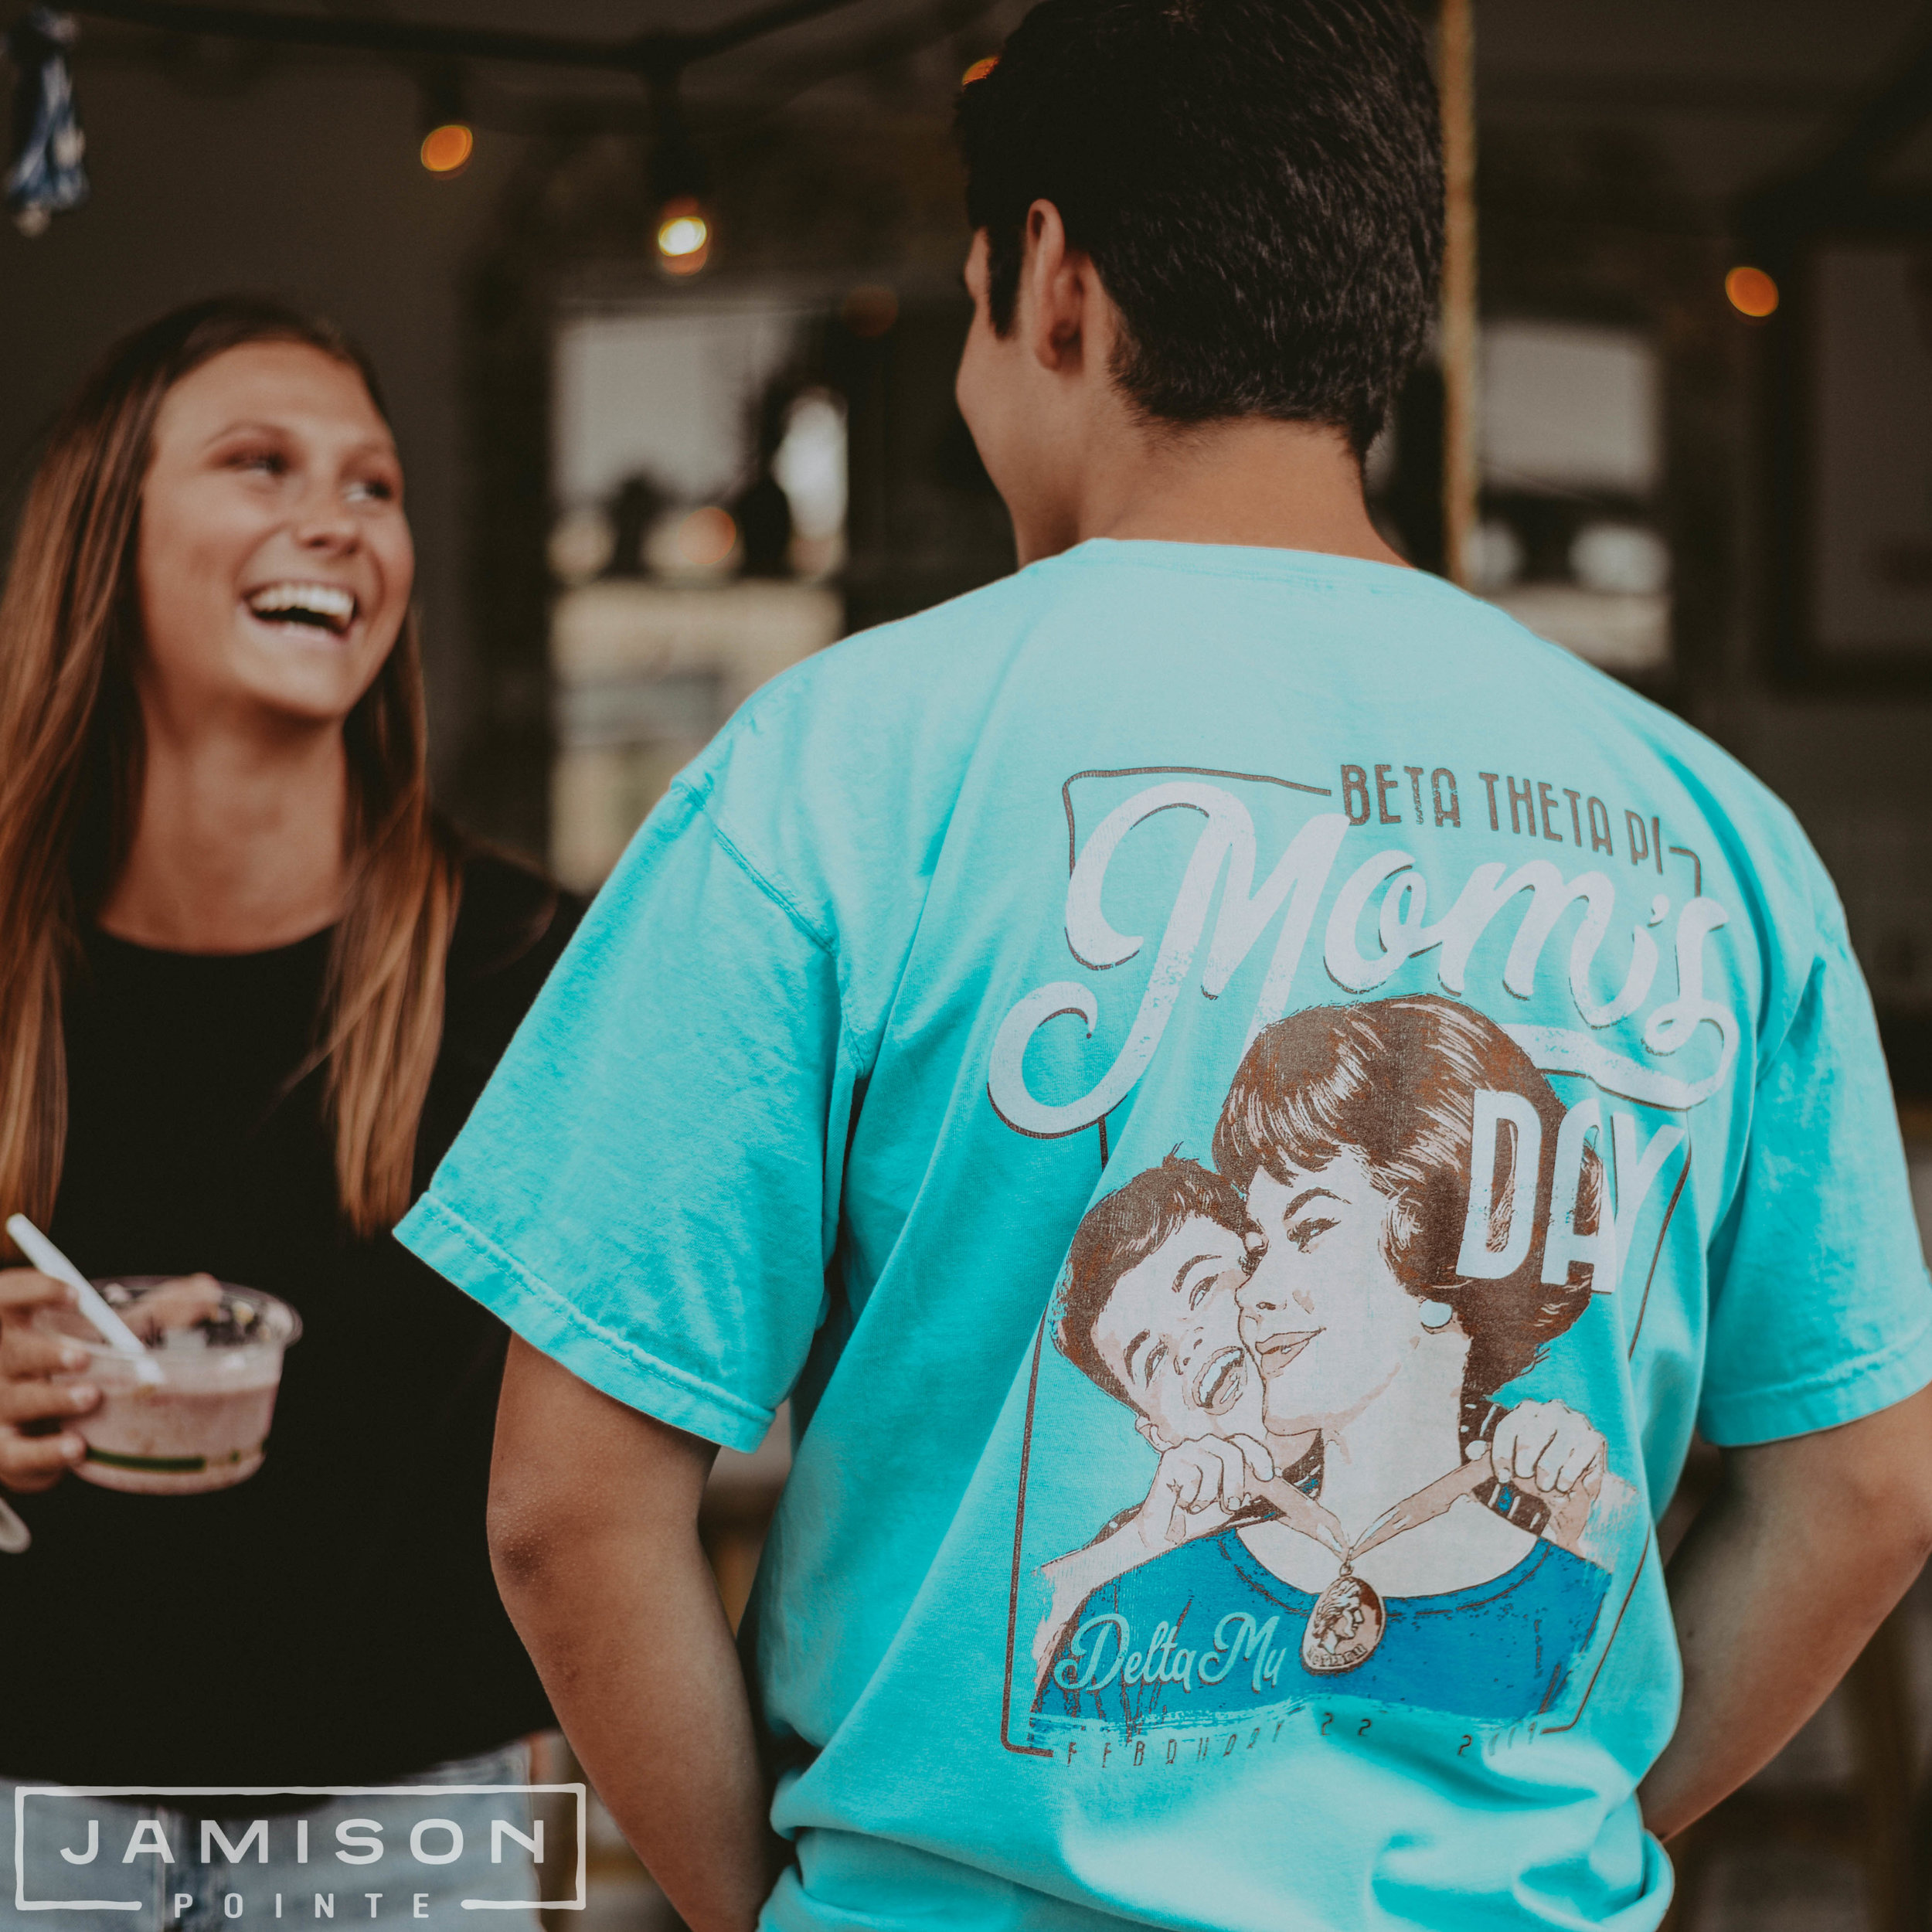 Beta Theta Pi Moms Day T-shirt